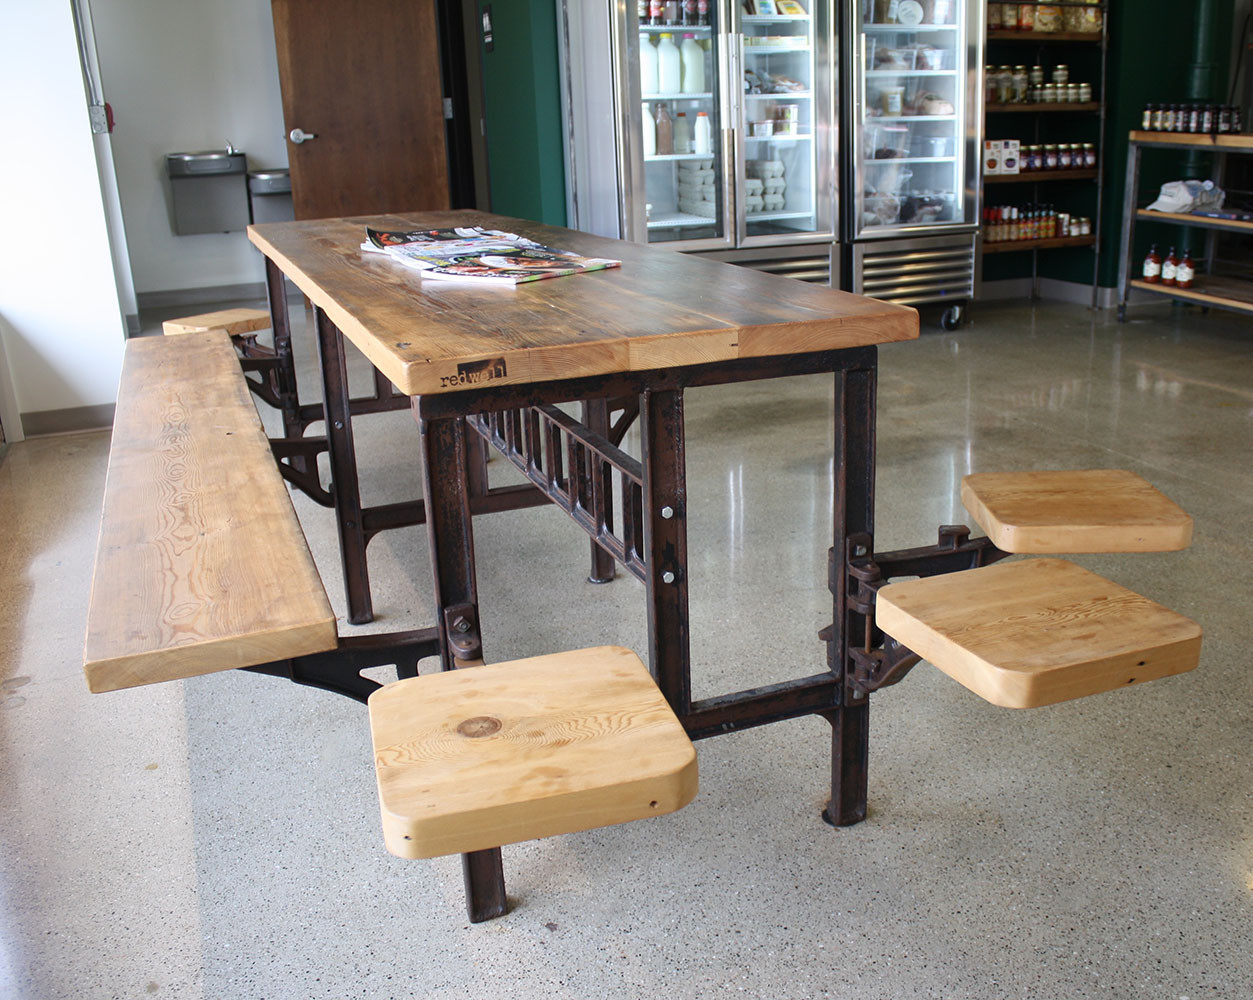 Cafe Table at E.A. Brady's